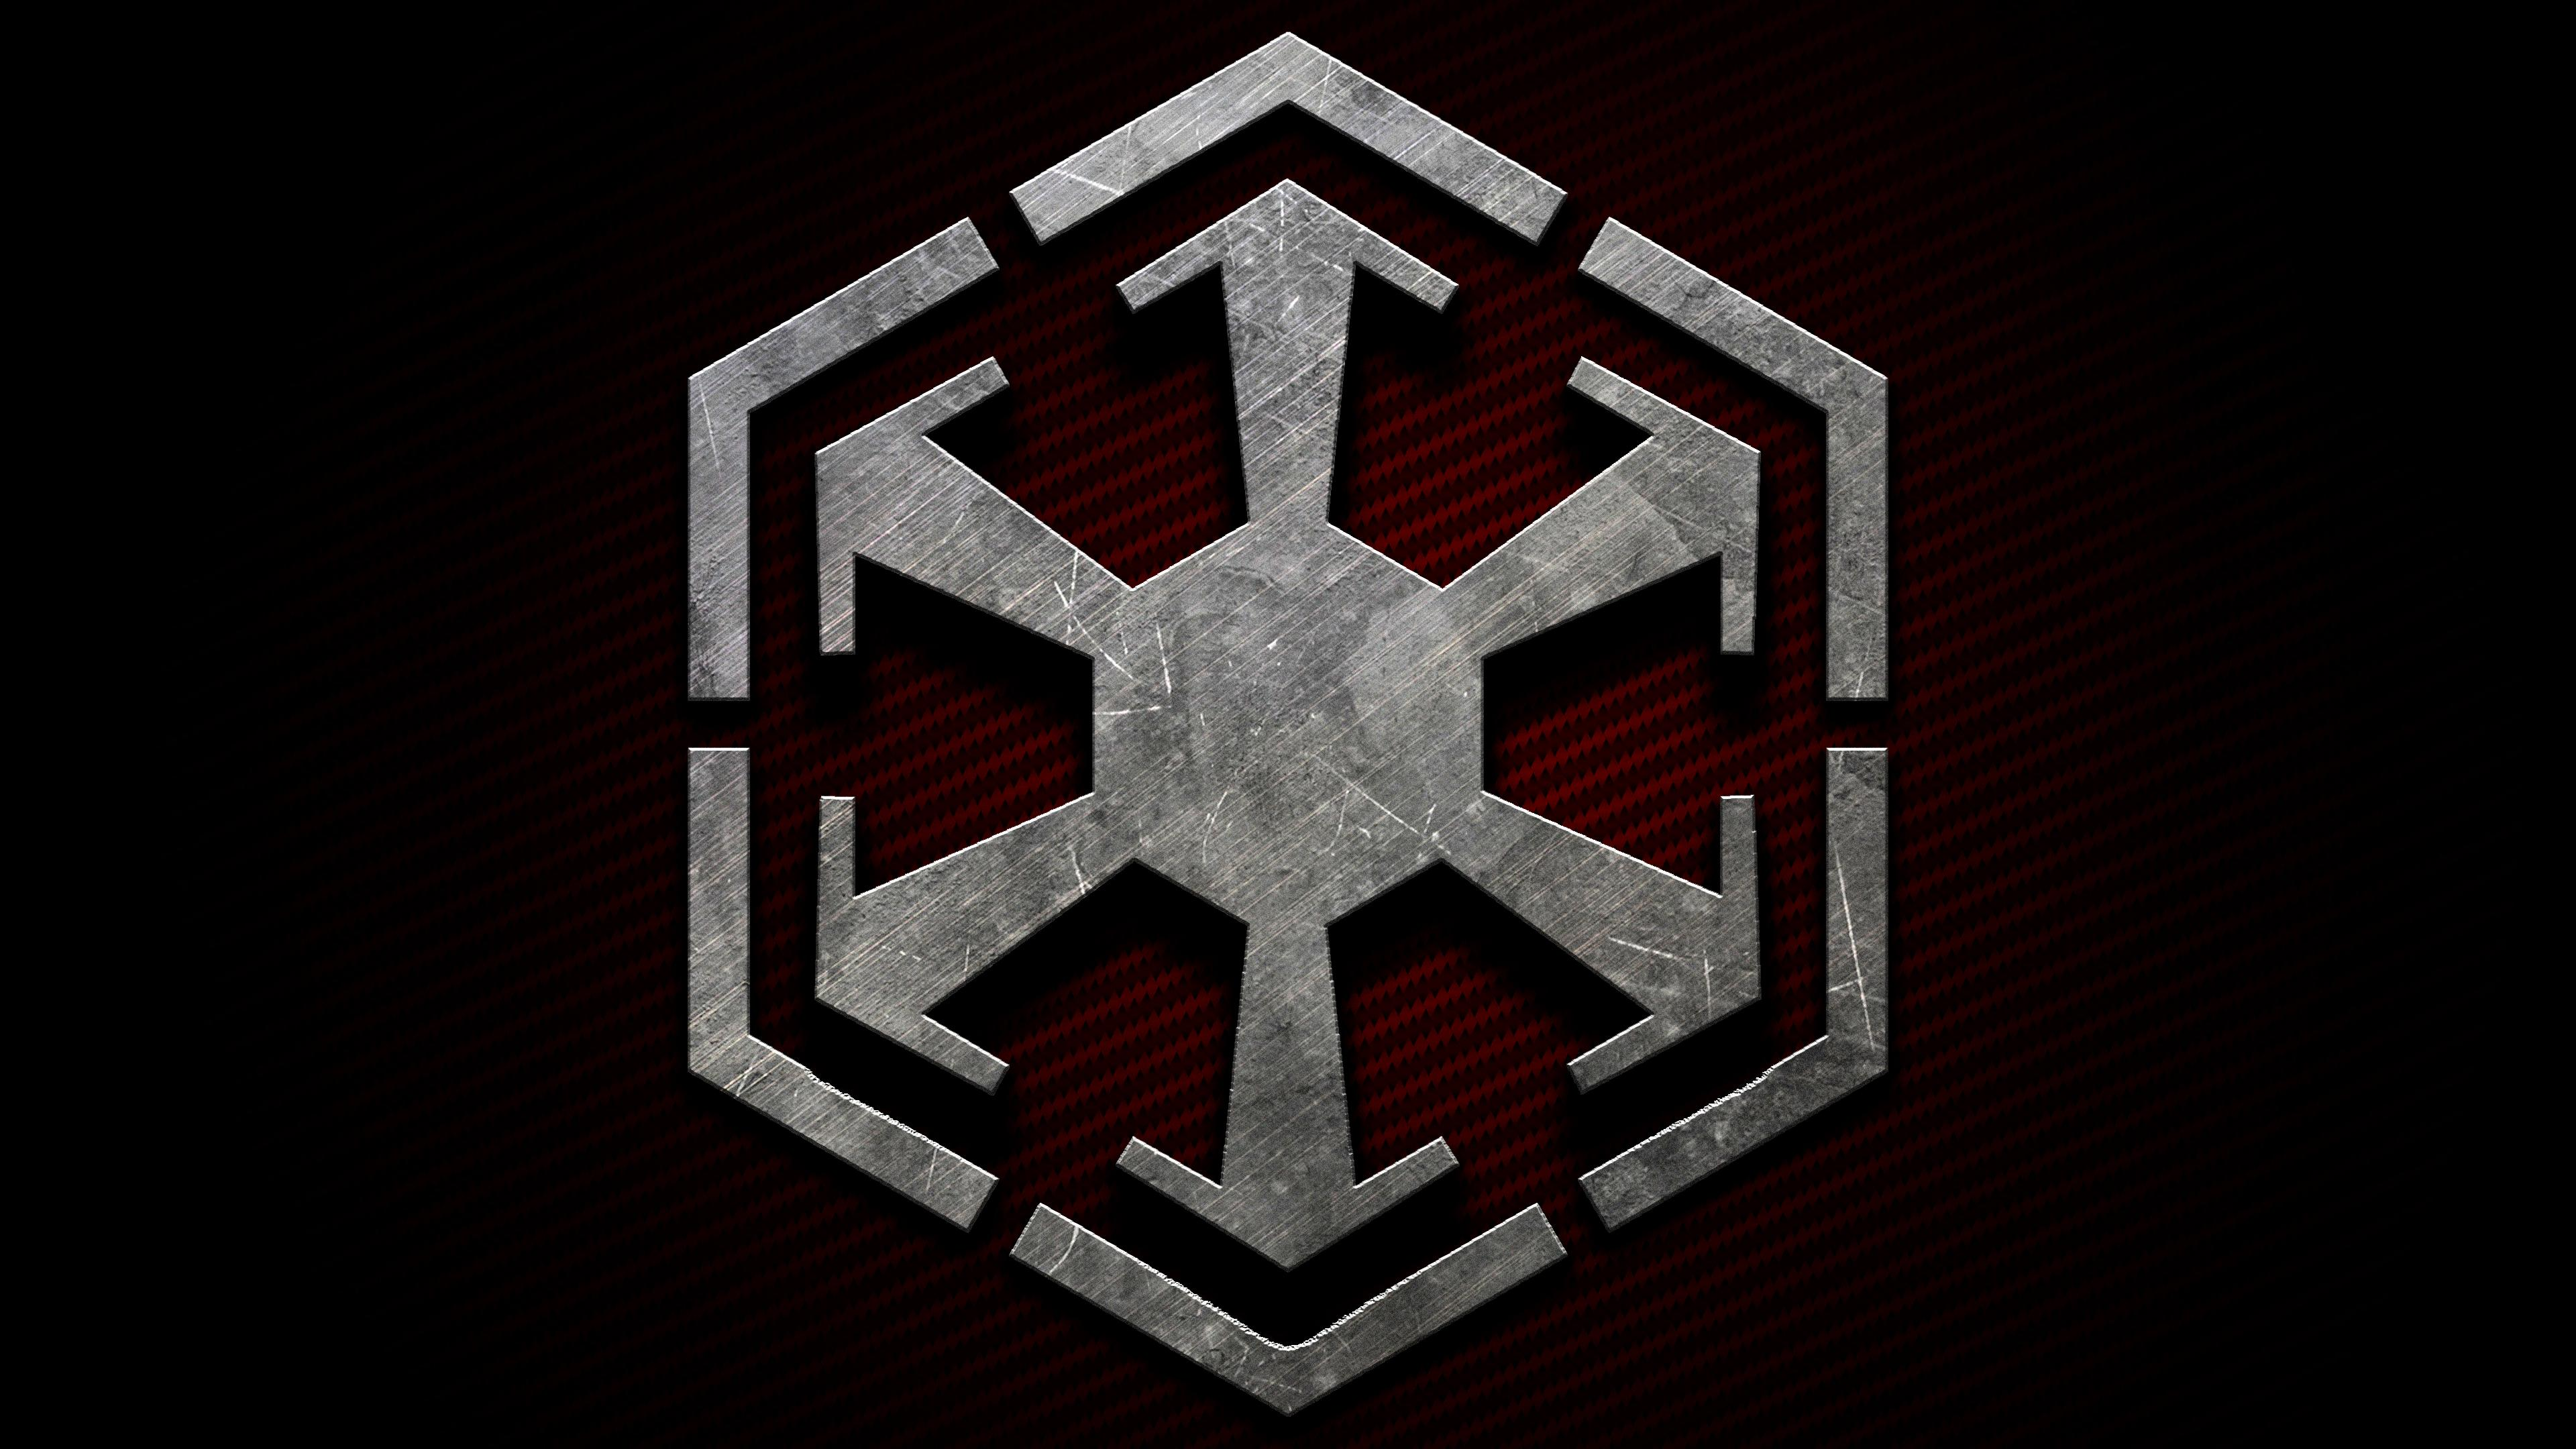 Download 4k Star Wars Old Republic Empire Symbol Iimgurcom